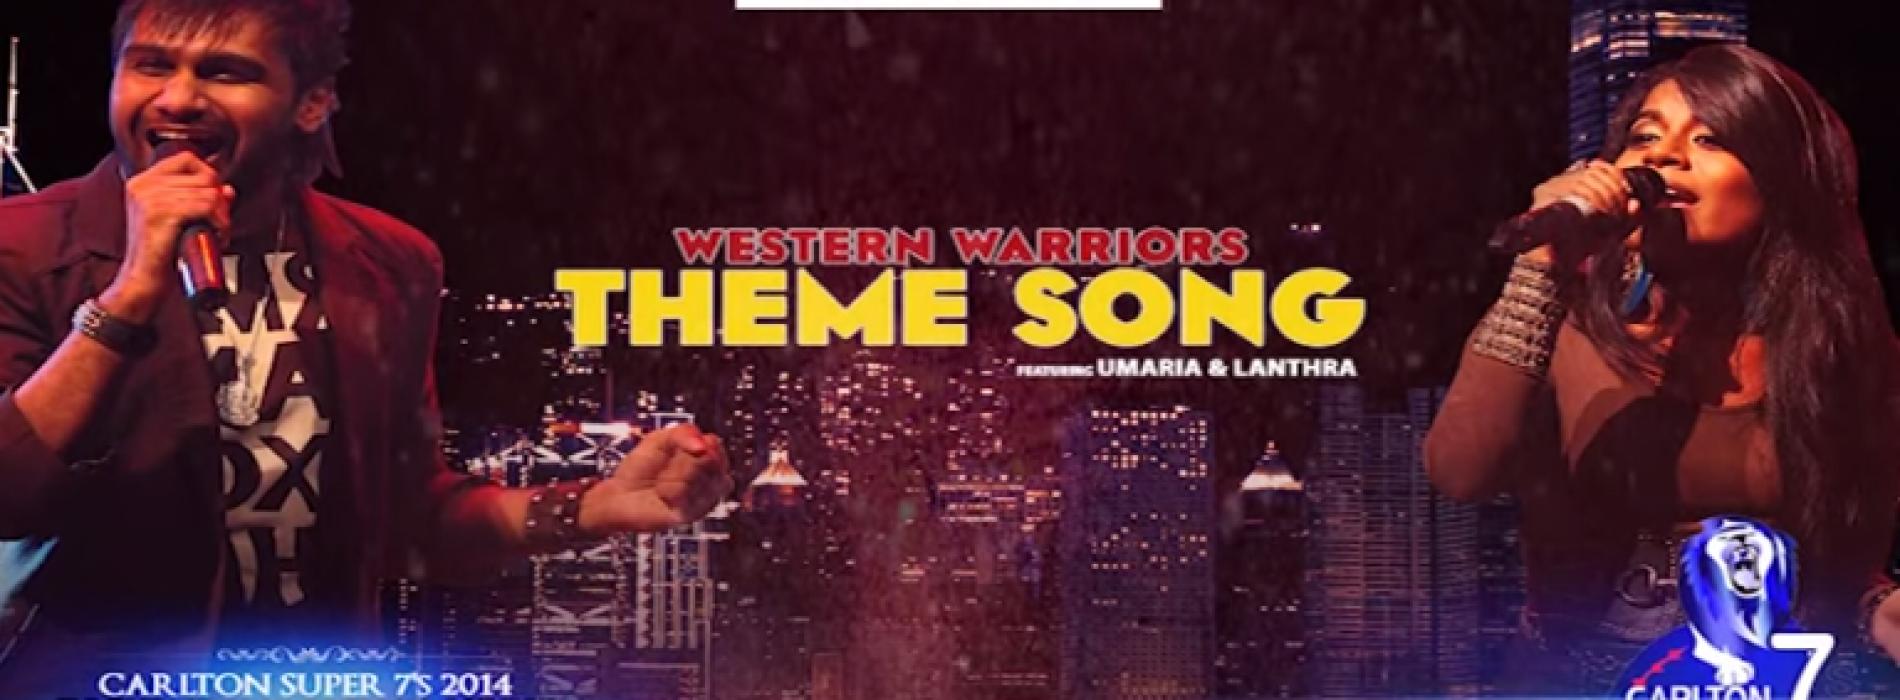 Lanthra & Umaaria: Western Warriors Theme Song